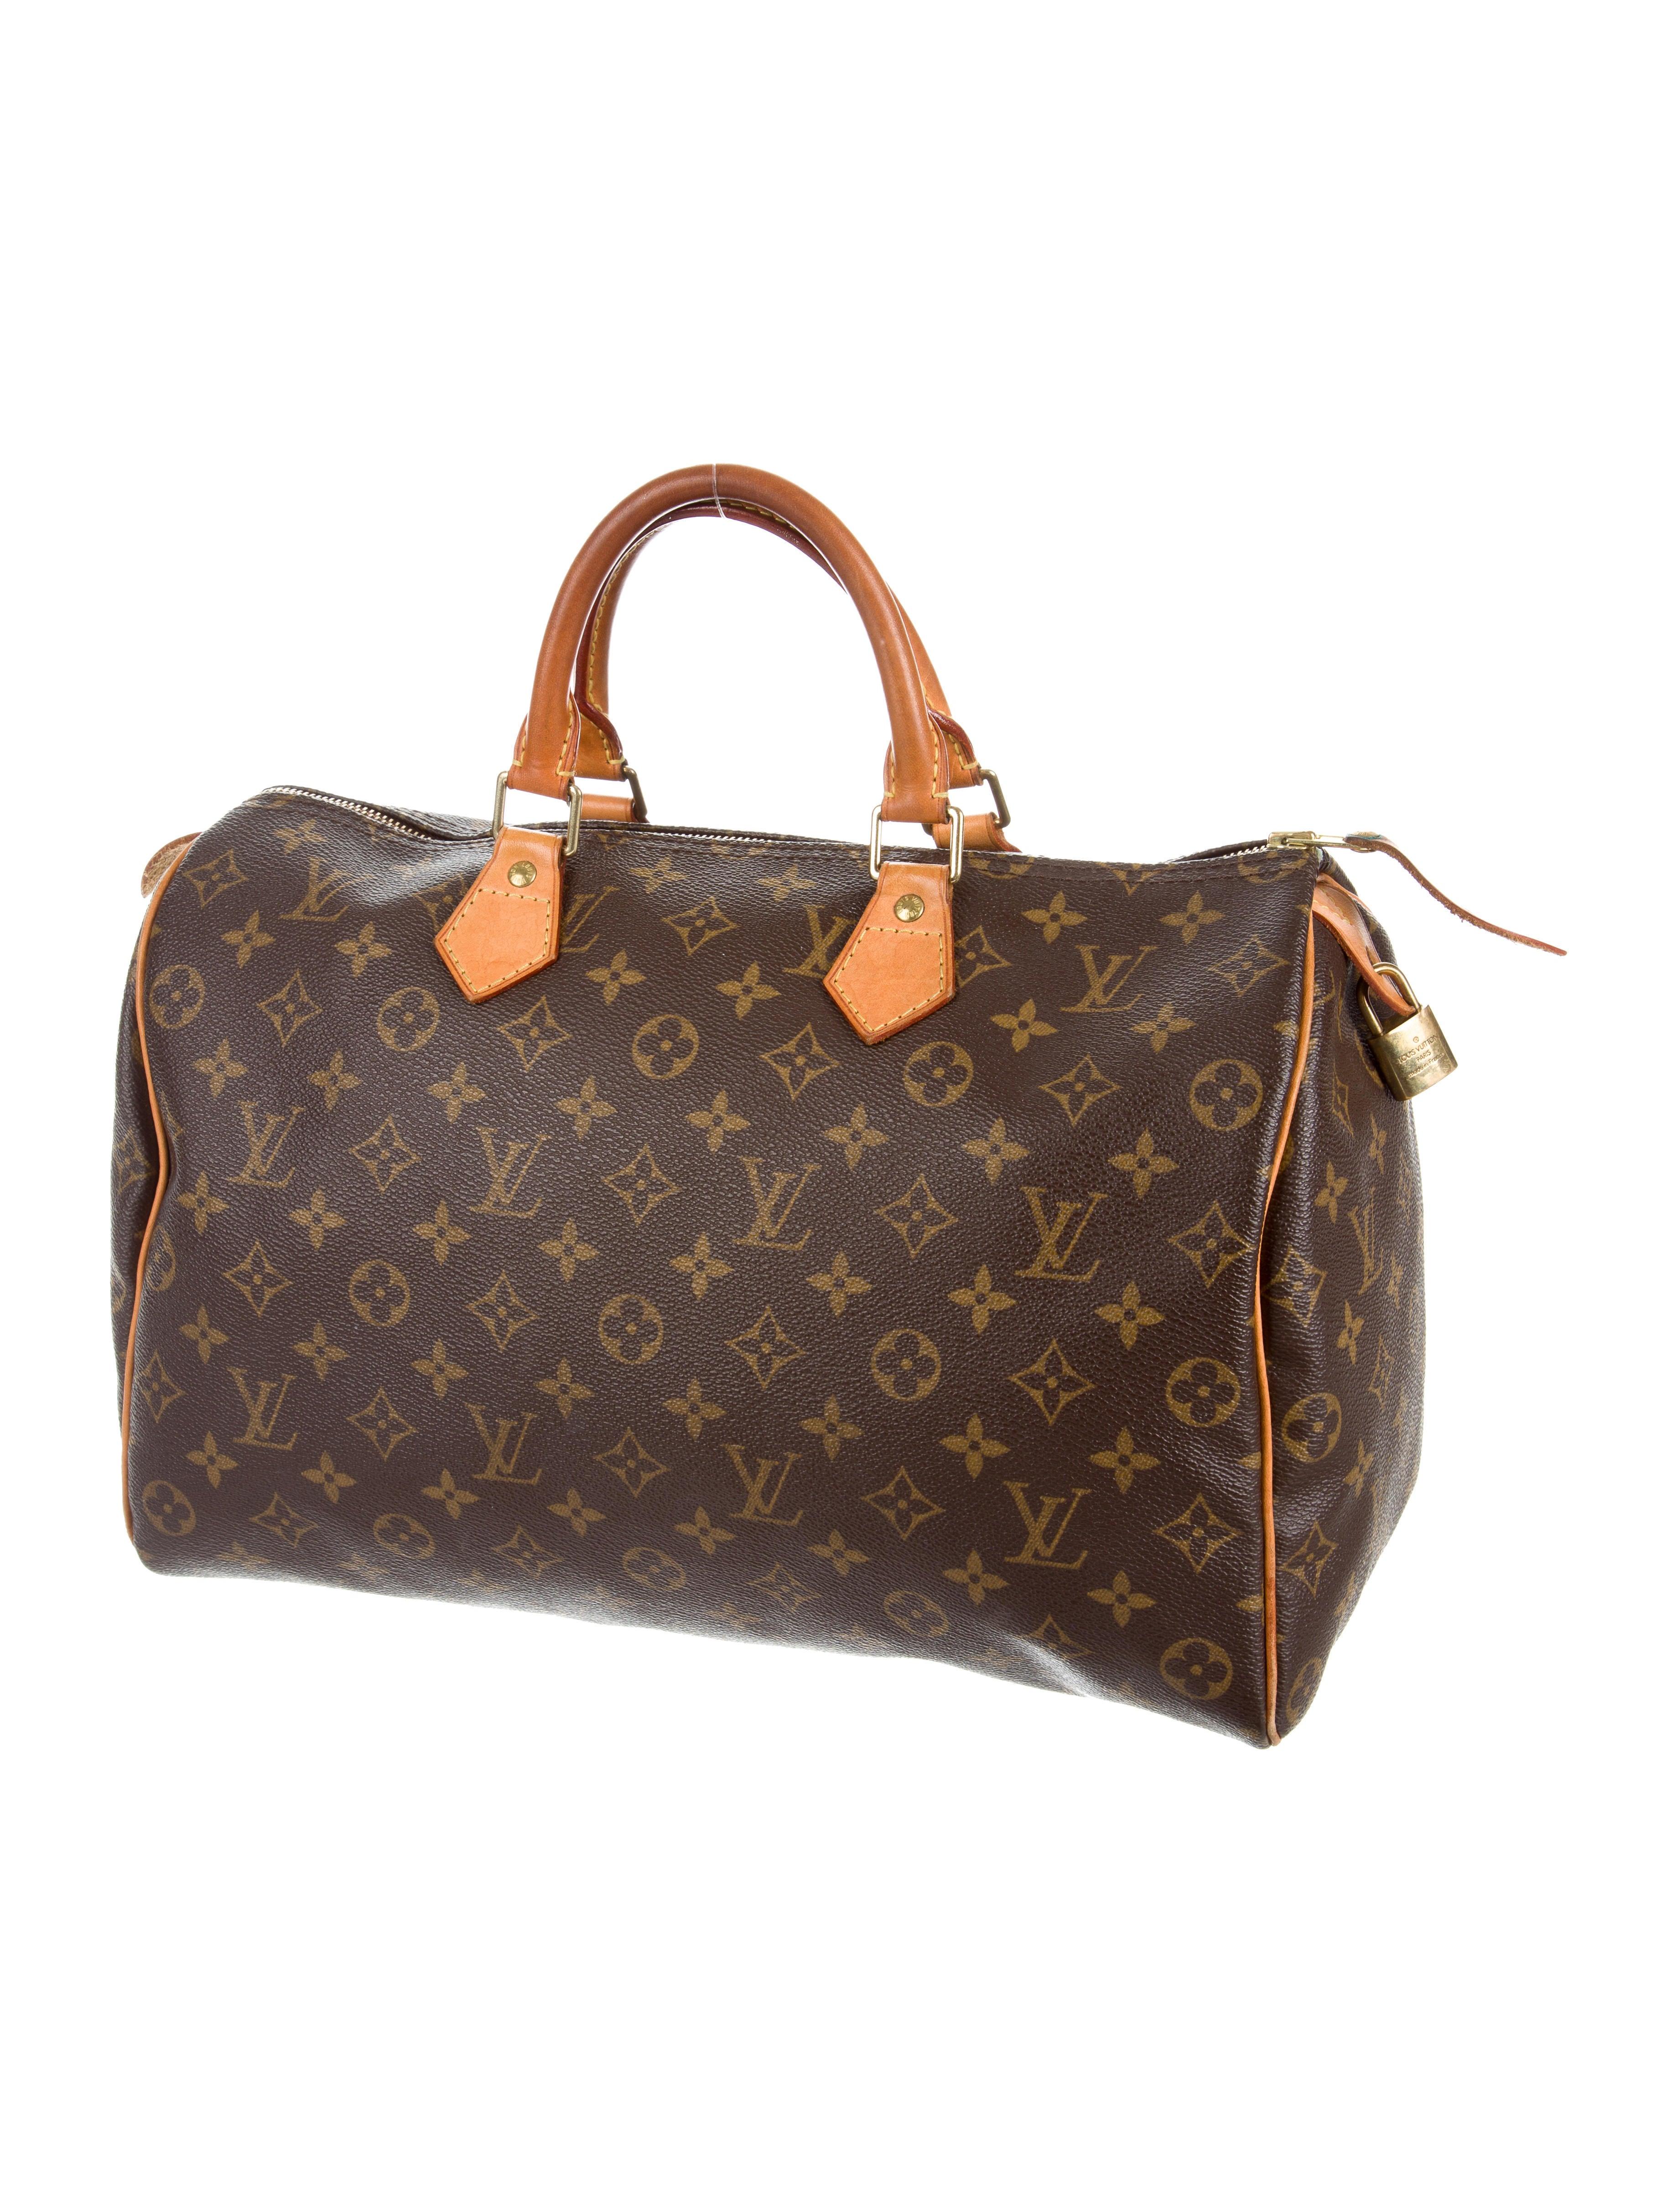 Louis vuitton monogram speedy 35 handbags lou122733 for Louis vuitton miroir speedy 35